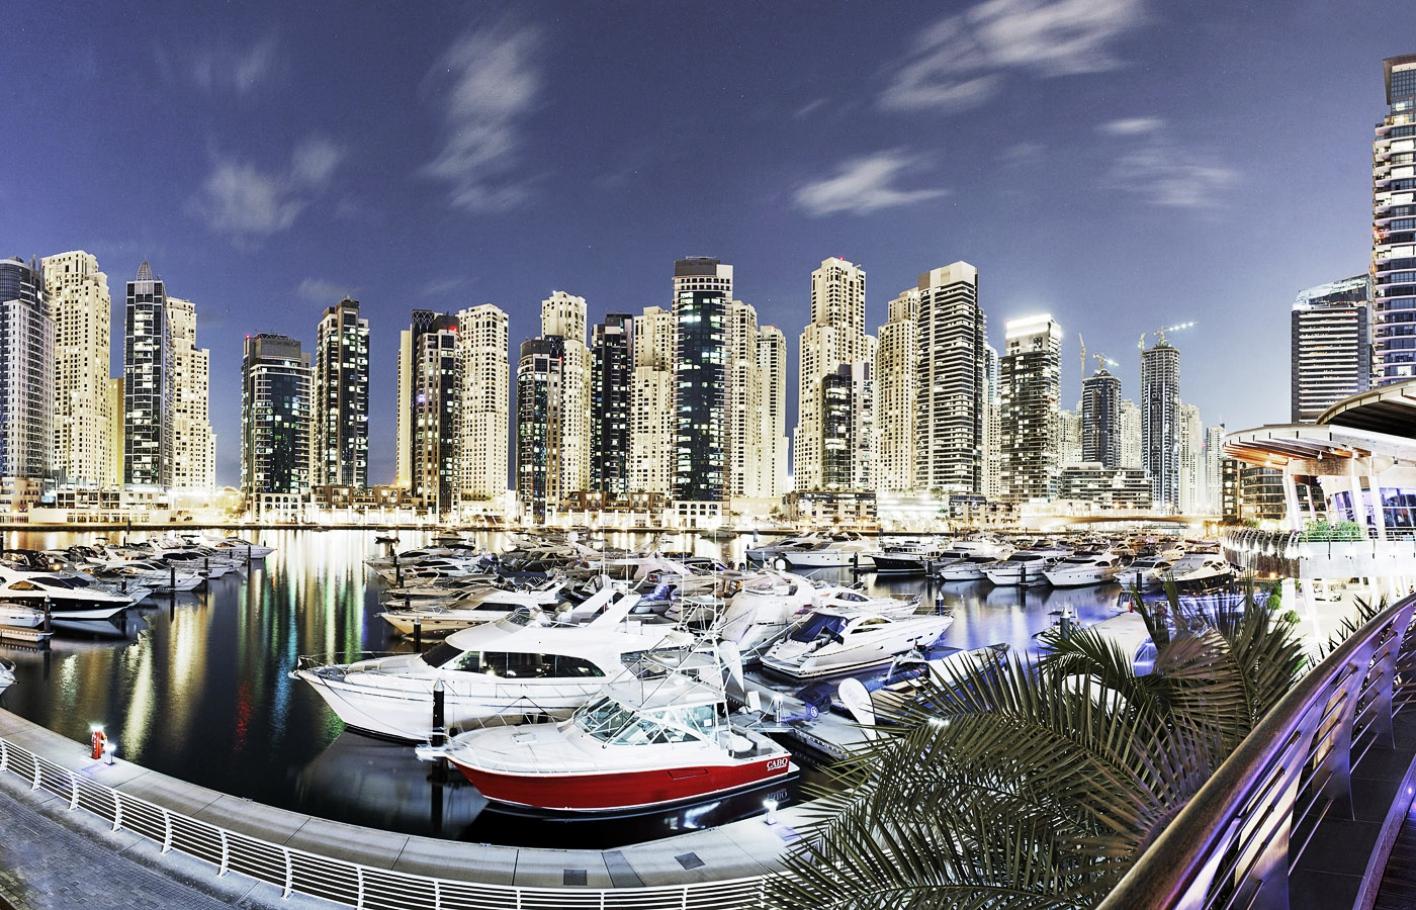 Дубай 50 лет назад нужна ли виза для транзита через оаэ